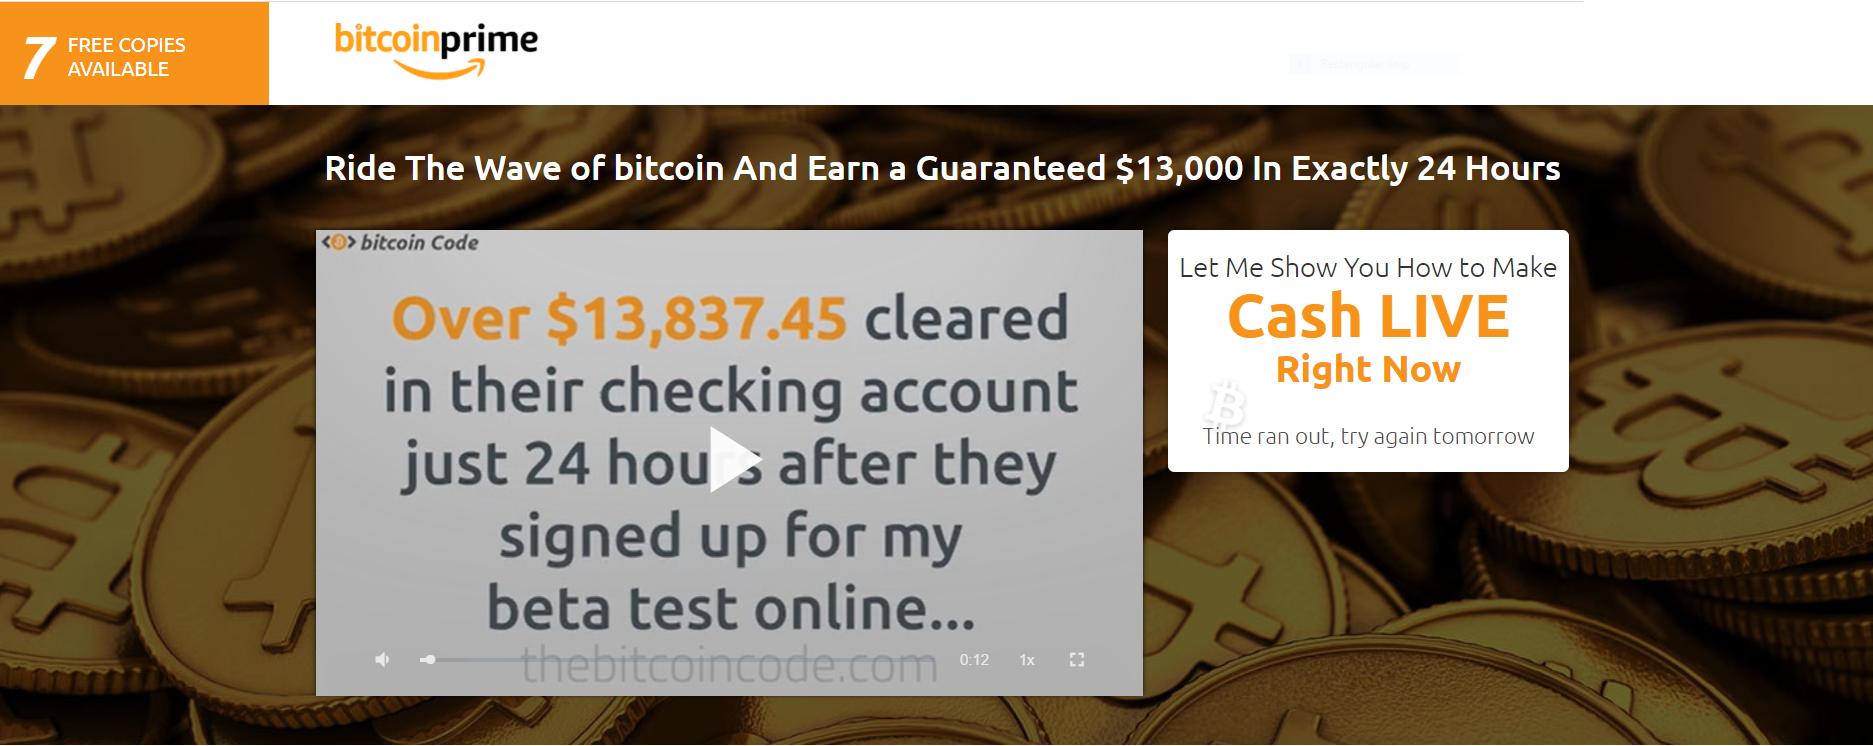 bitcoin prime main screen